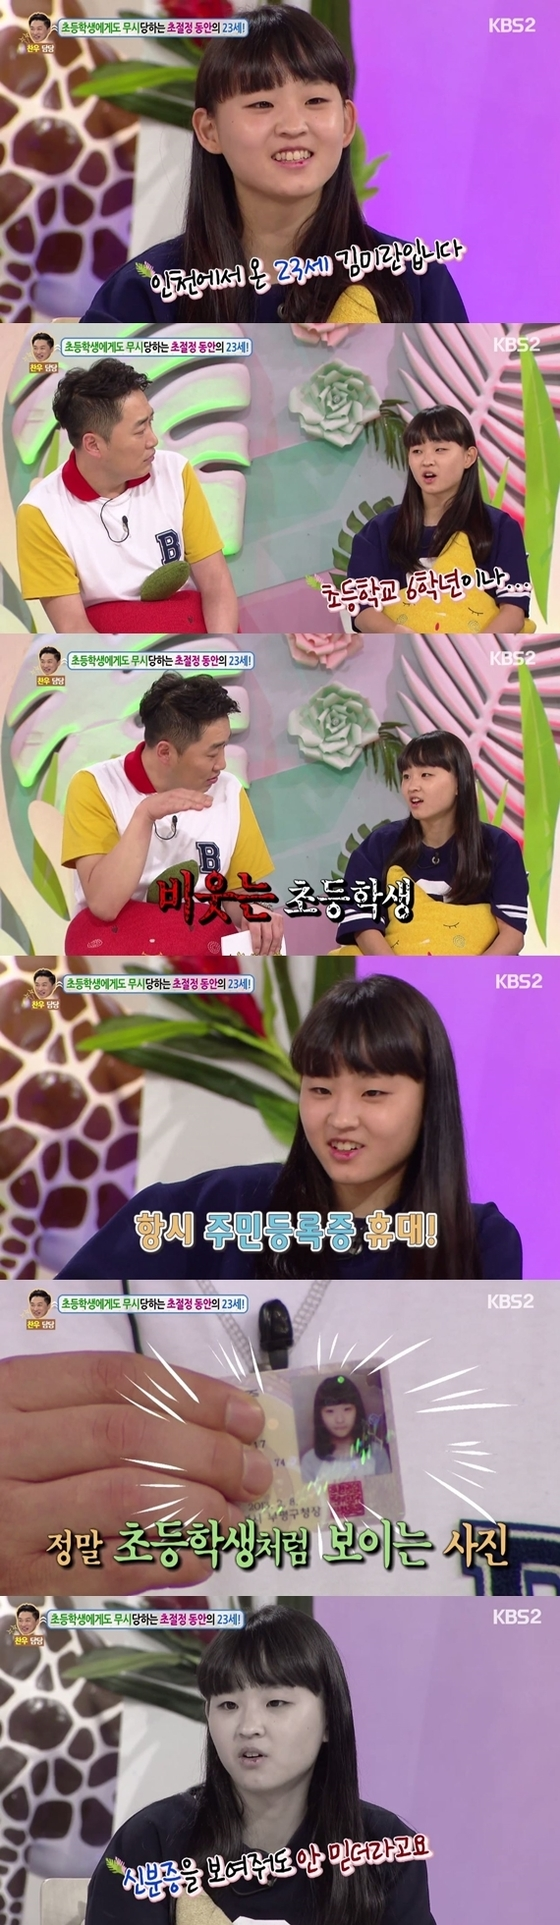 KBS2 '대국민 토크쇼 안녕하세요'